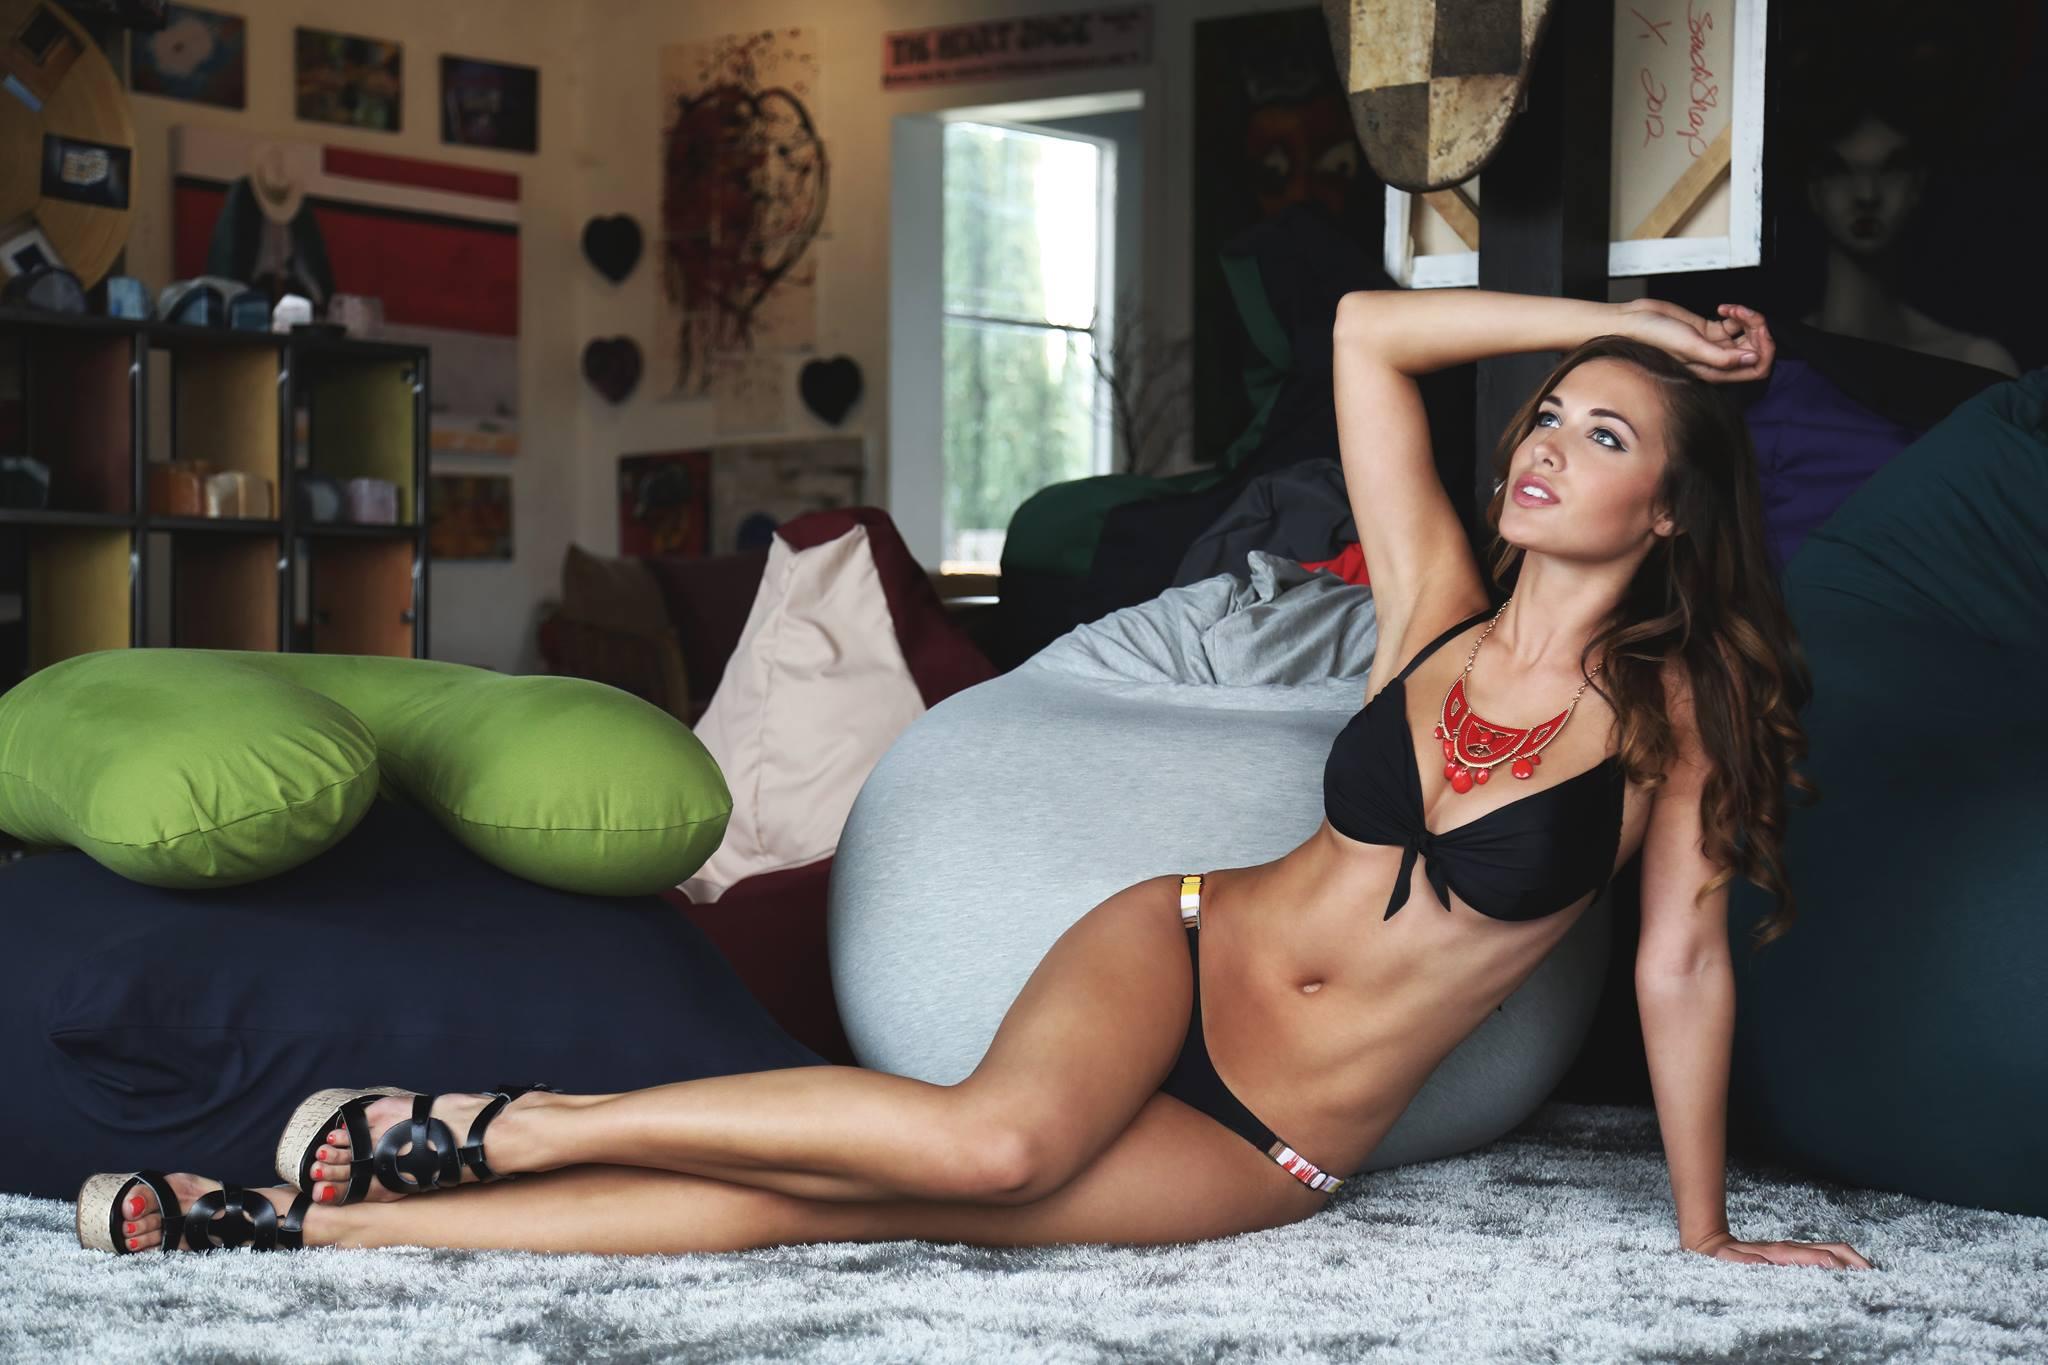 Mikayla Carr in a bikini